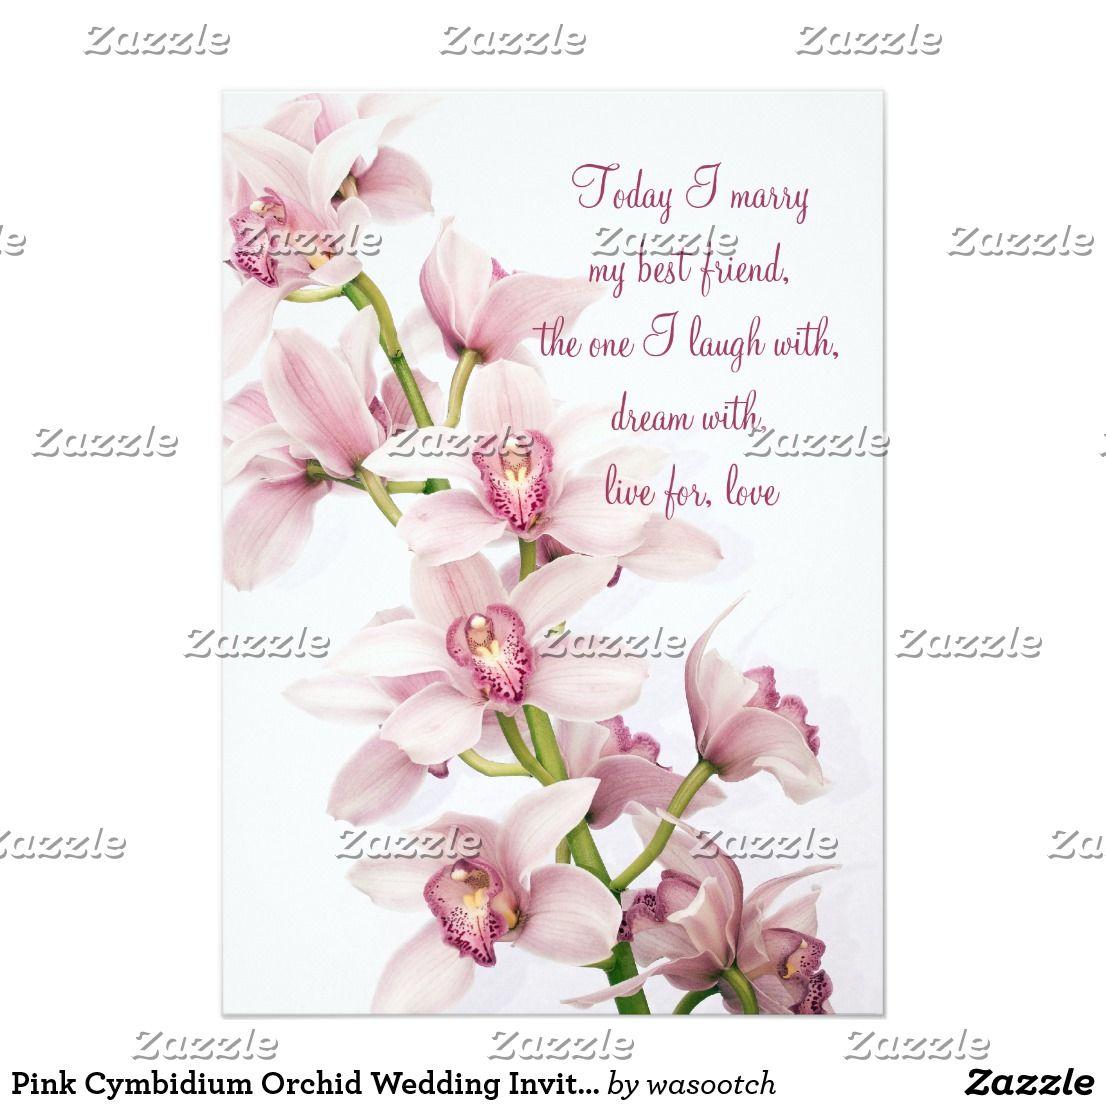 Pink Cymbidium Orchid Wedding Invitation 5x7 Size | Orchid wedding ...